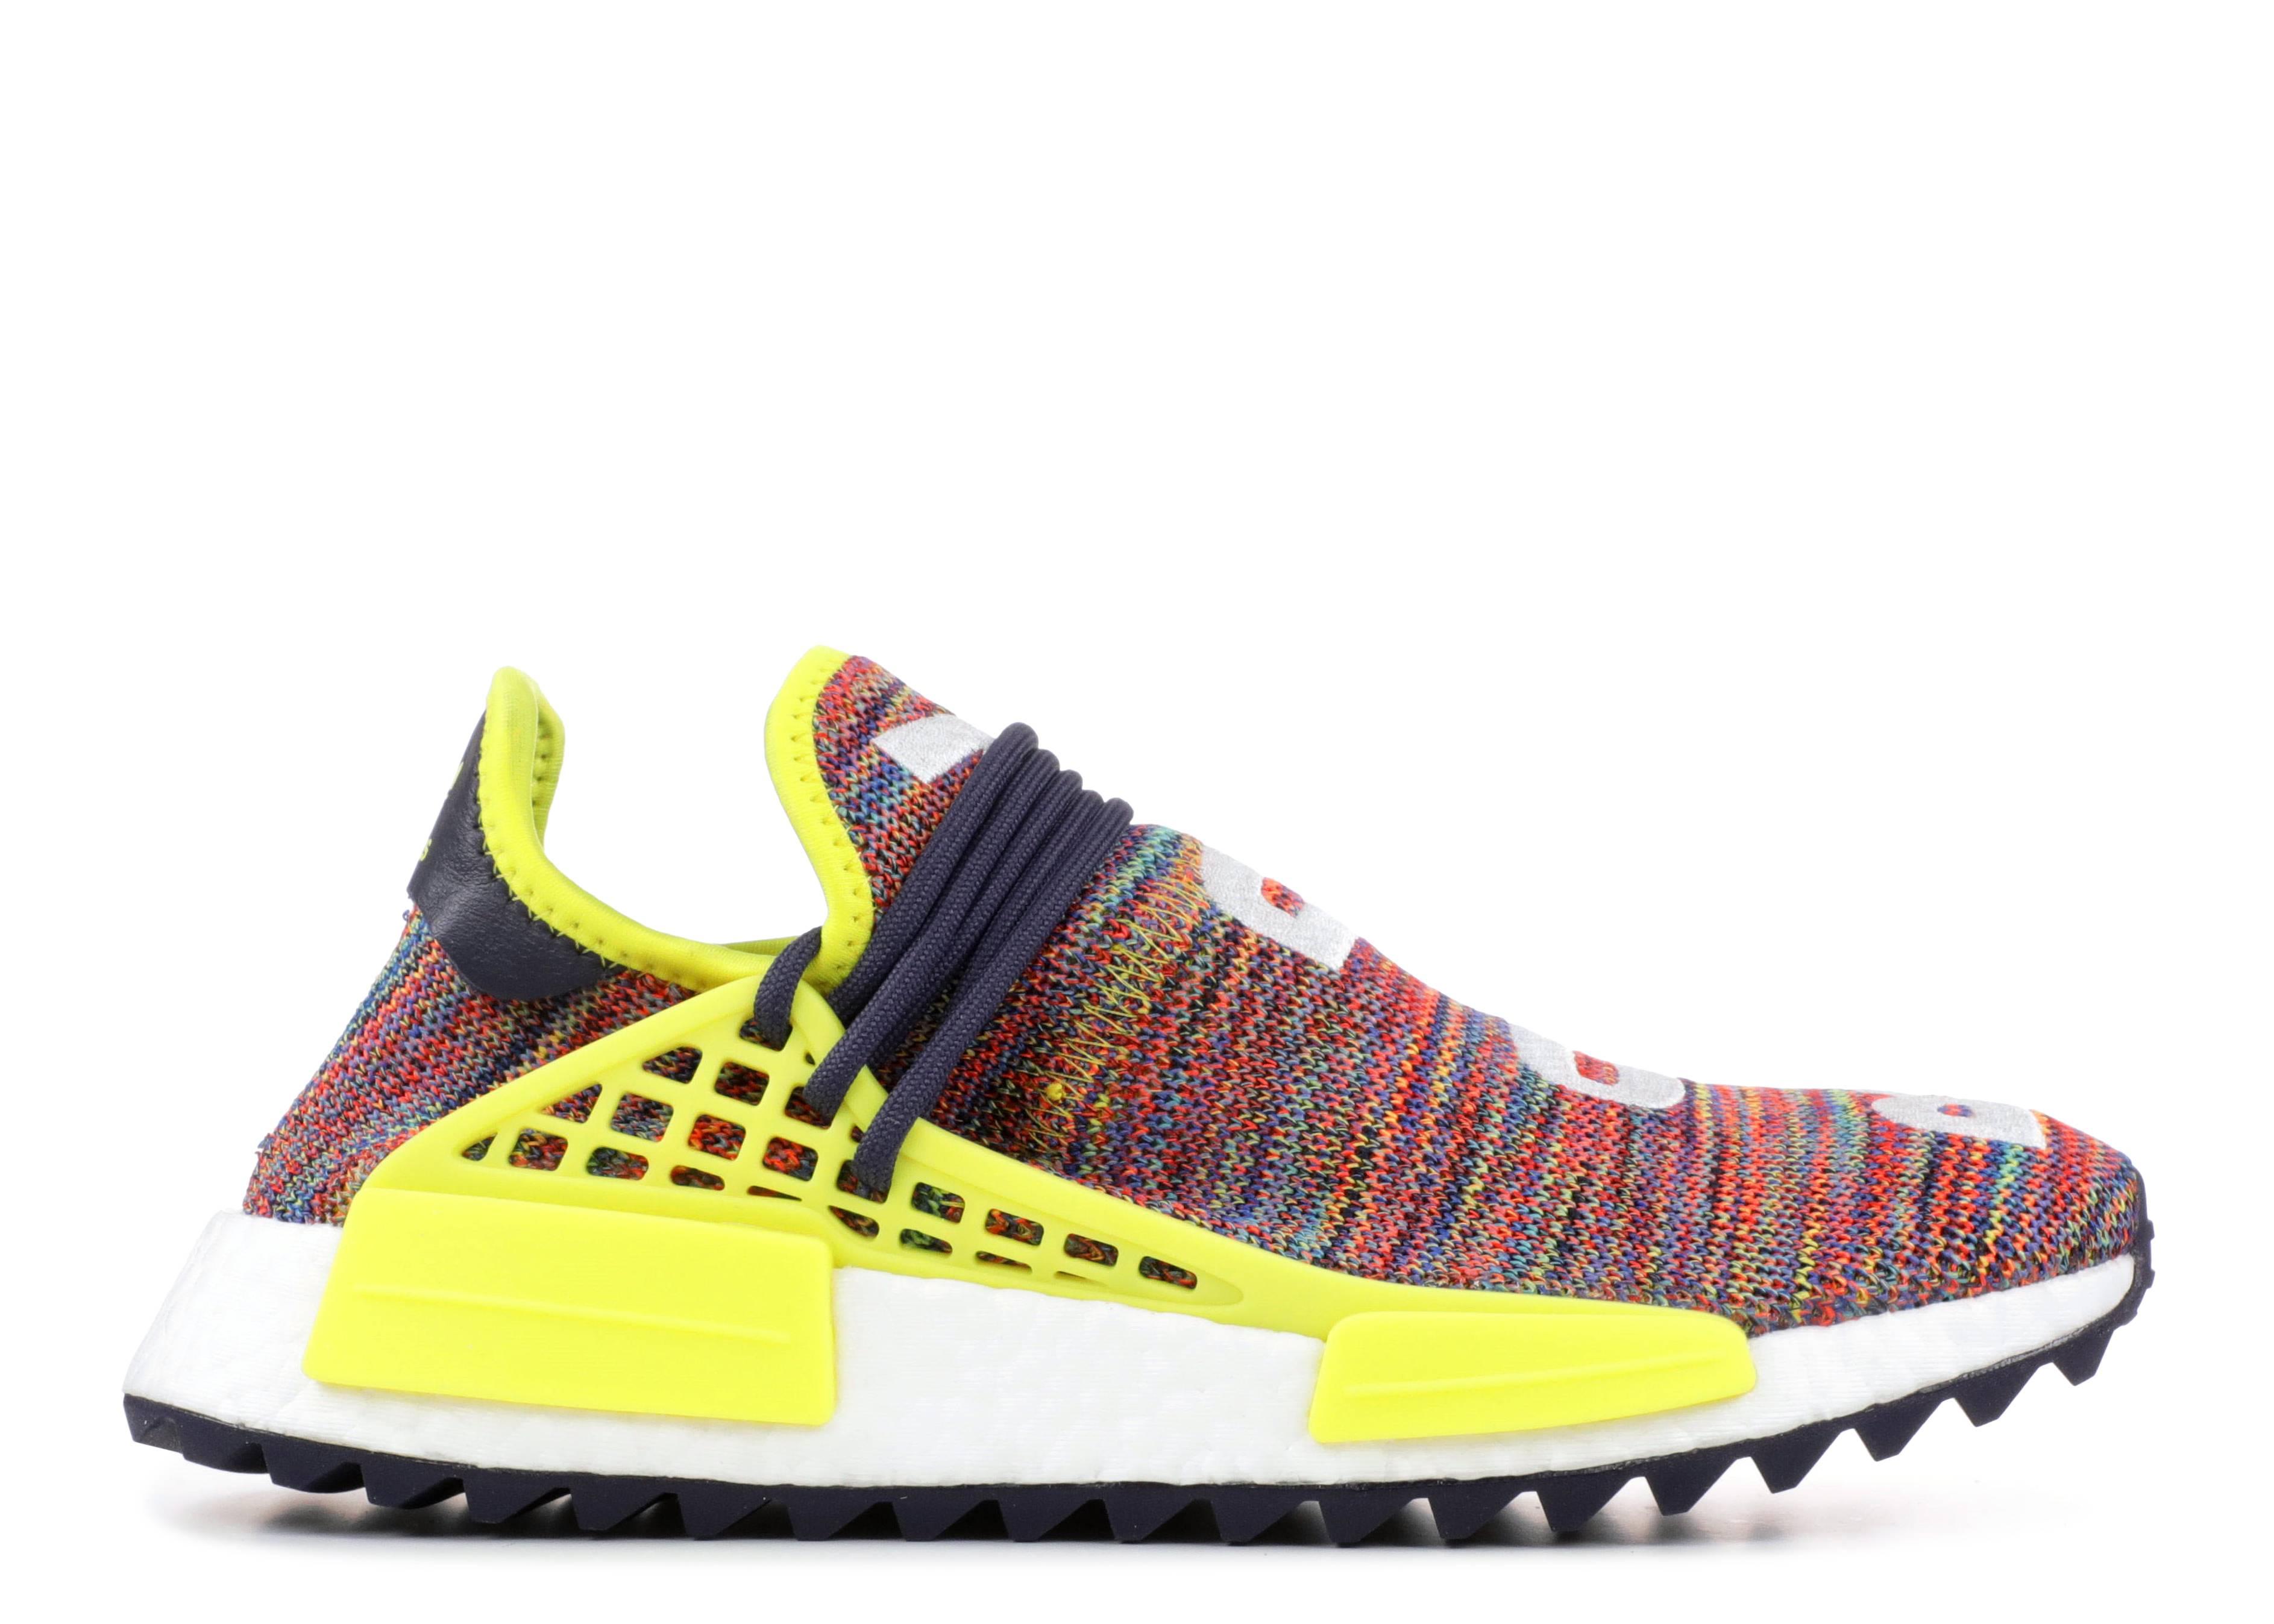 Bape adidas NMD R1 Sneakerheads Amino